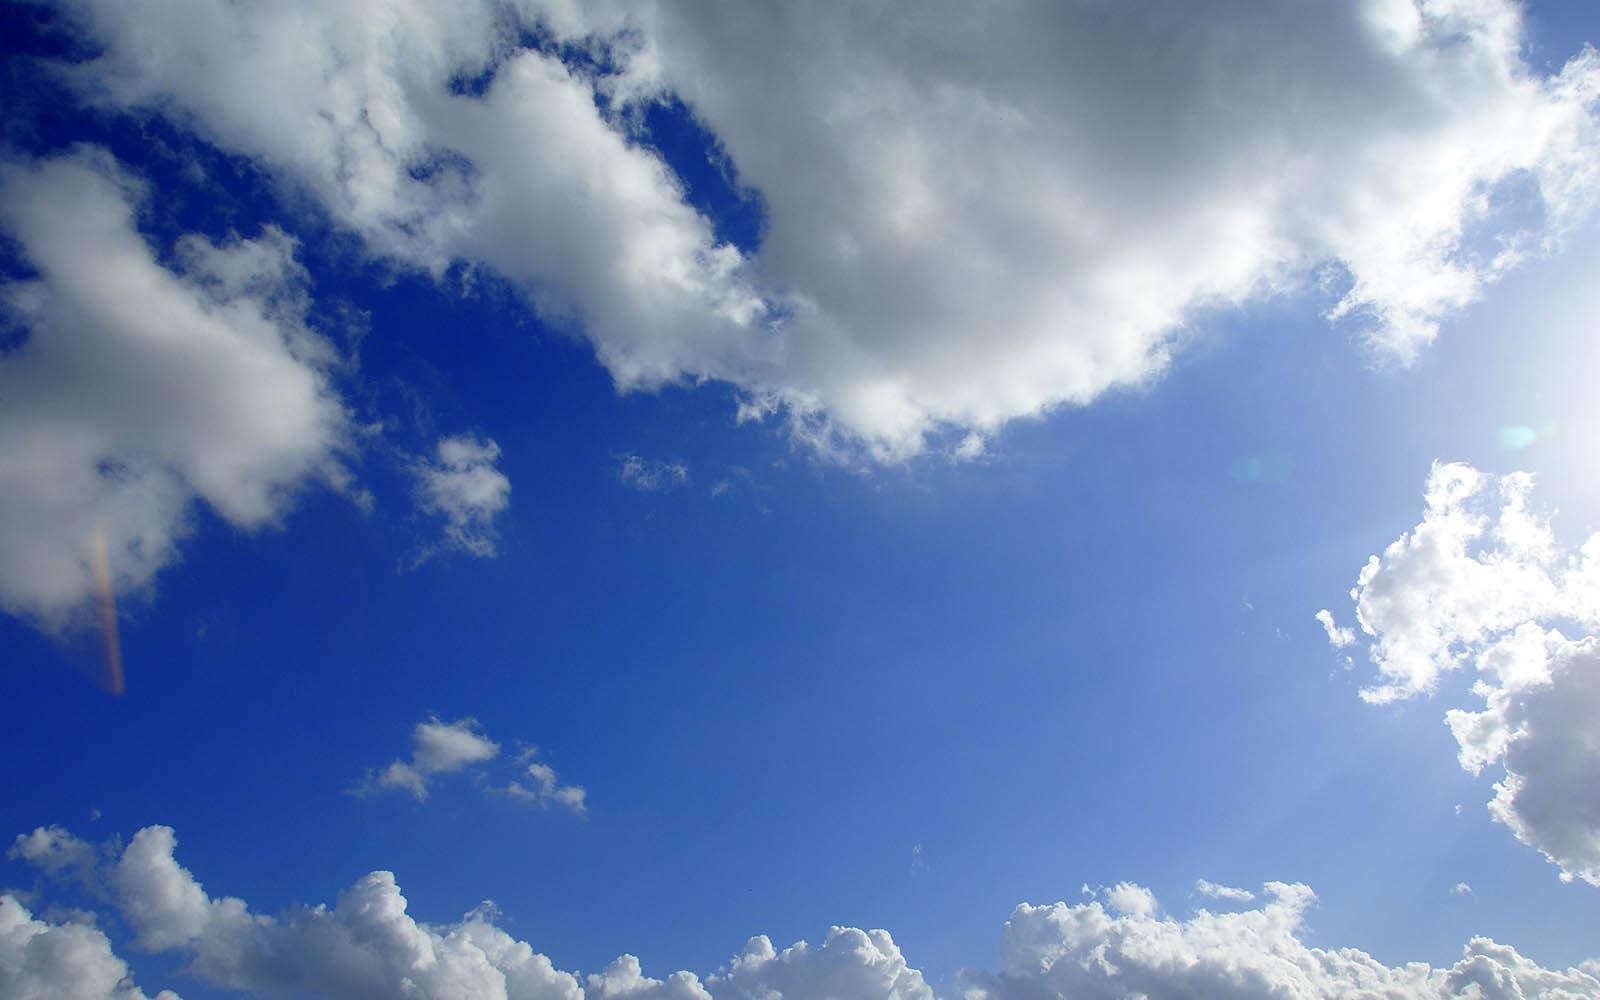 sky wallpaper for desktop - photo #5